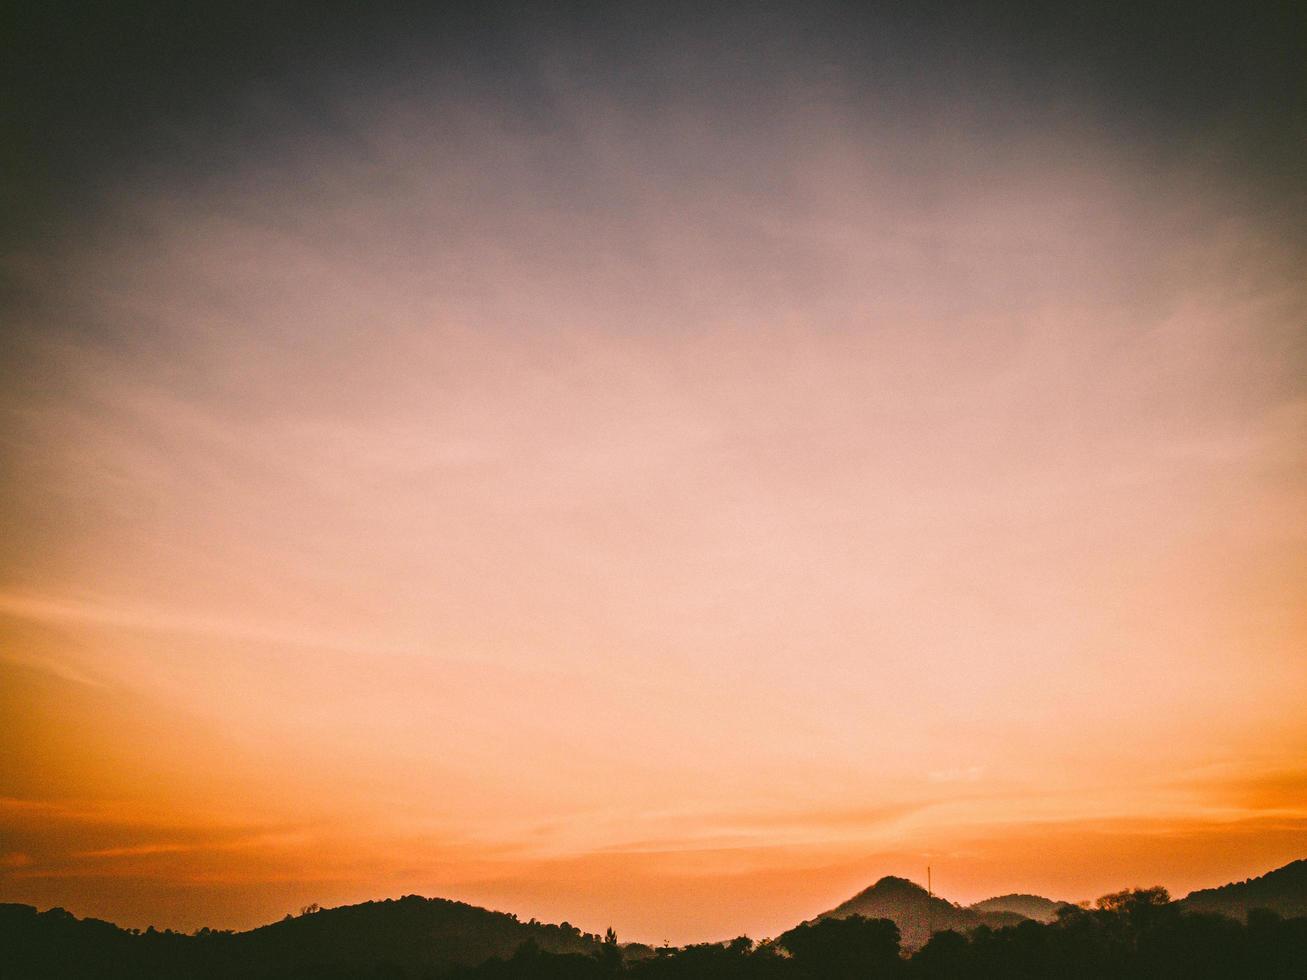 Sonnenuntergang Himmel und Berg foto